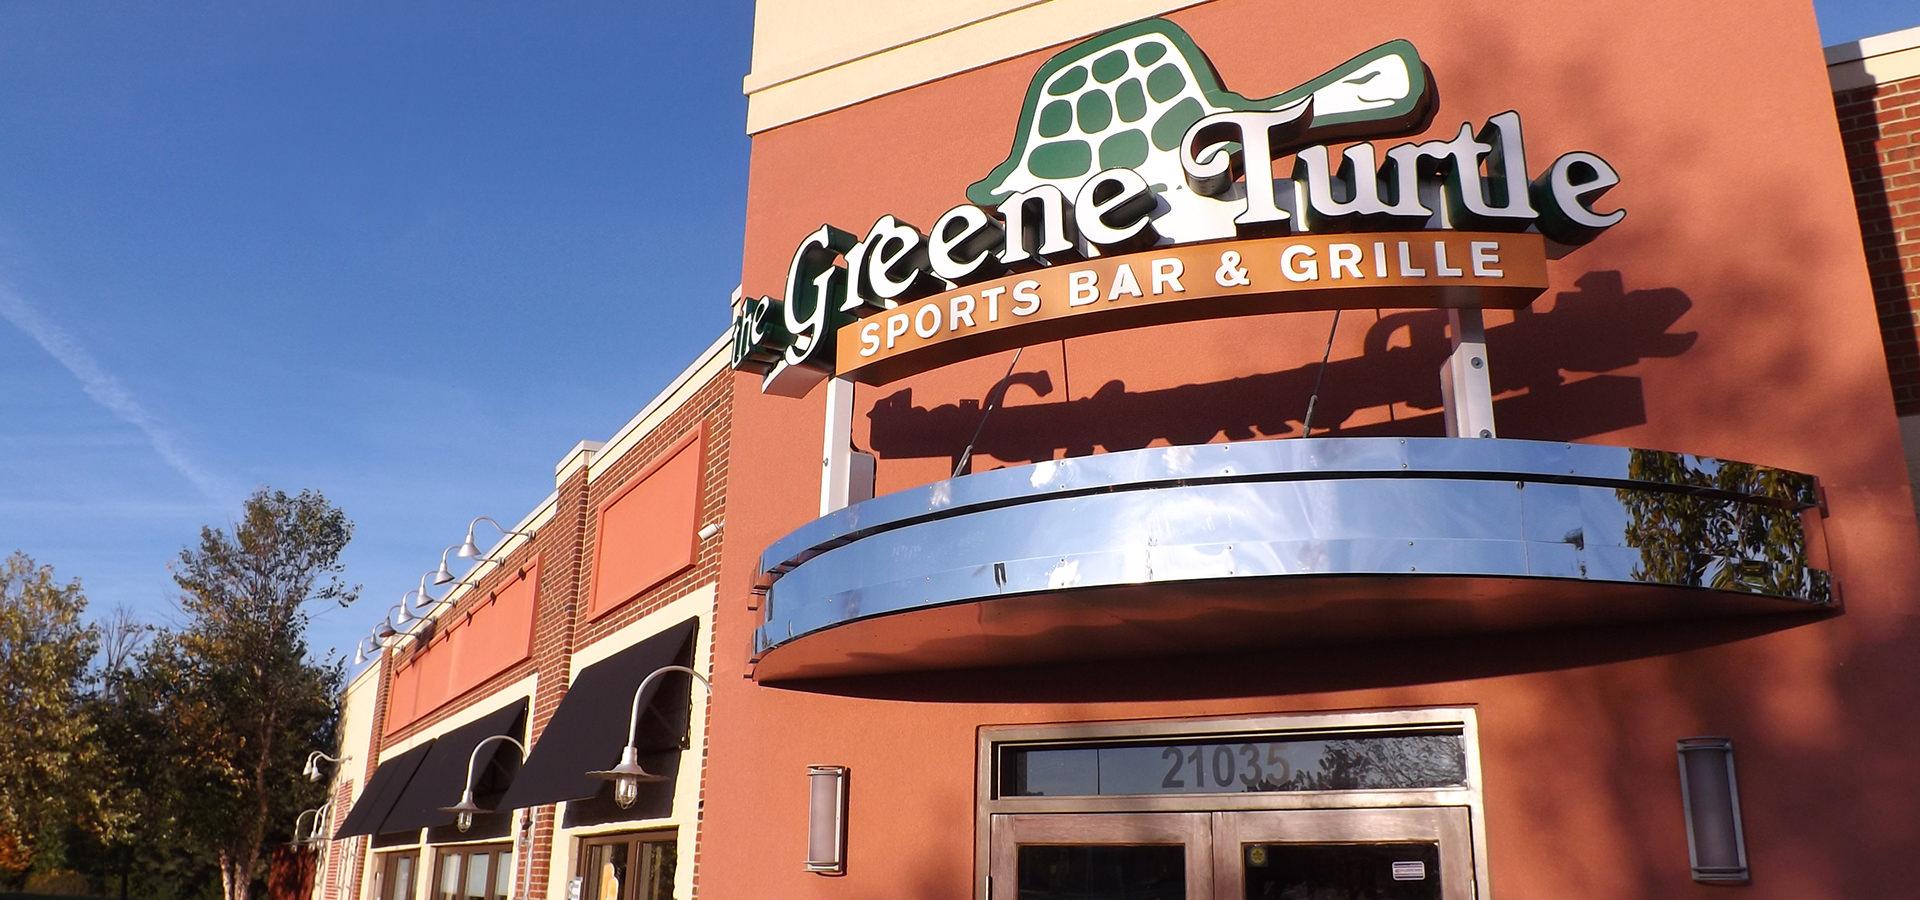 Green turtle sports bar